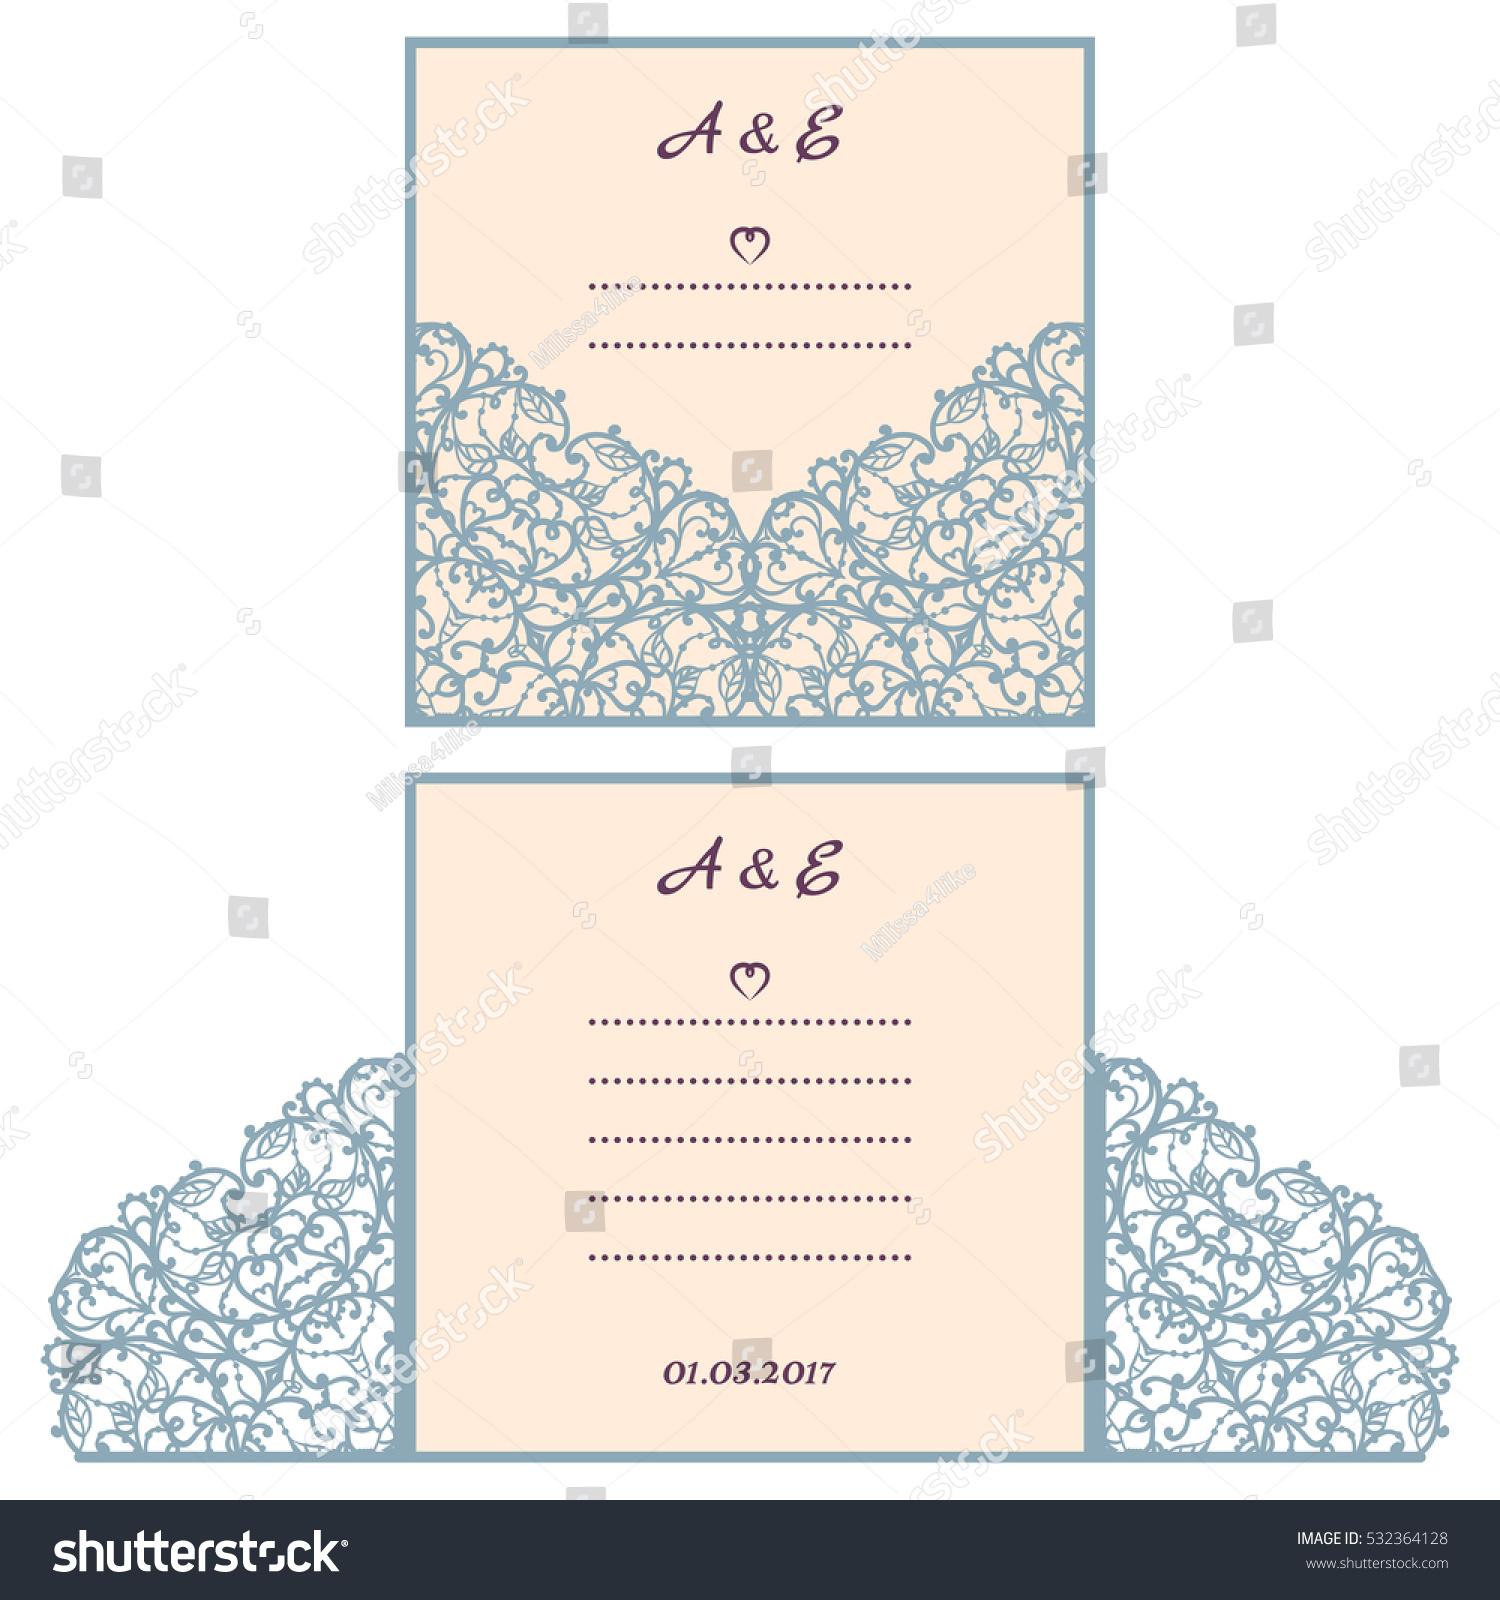 Wedding Invitation Greeting Card Abstract Ornament Stock Vector ...